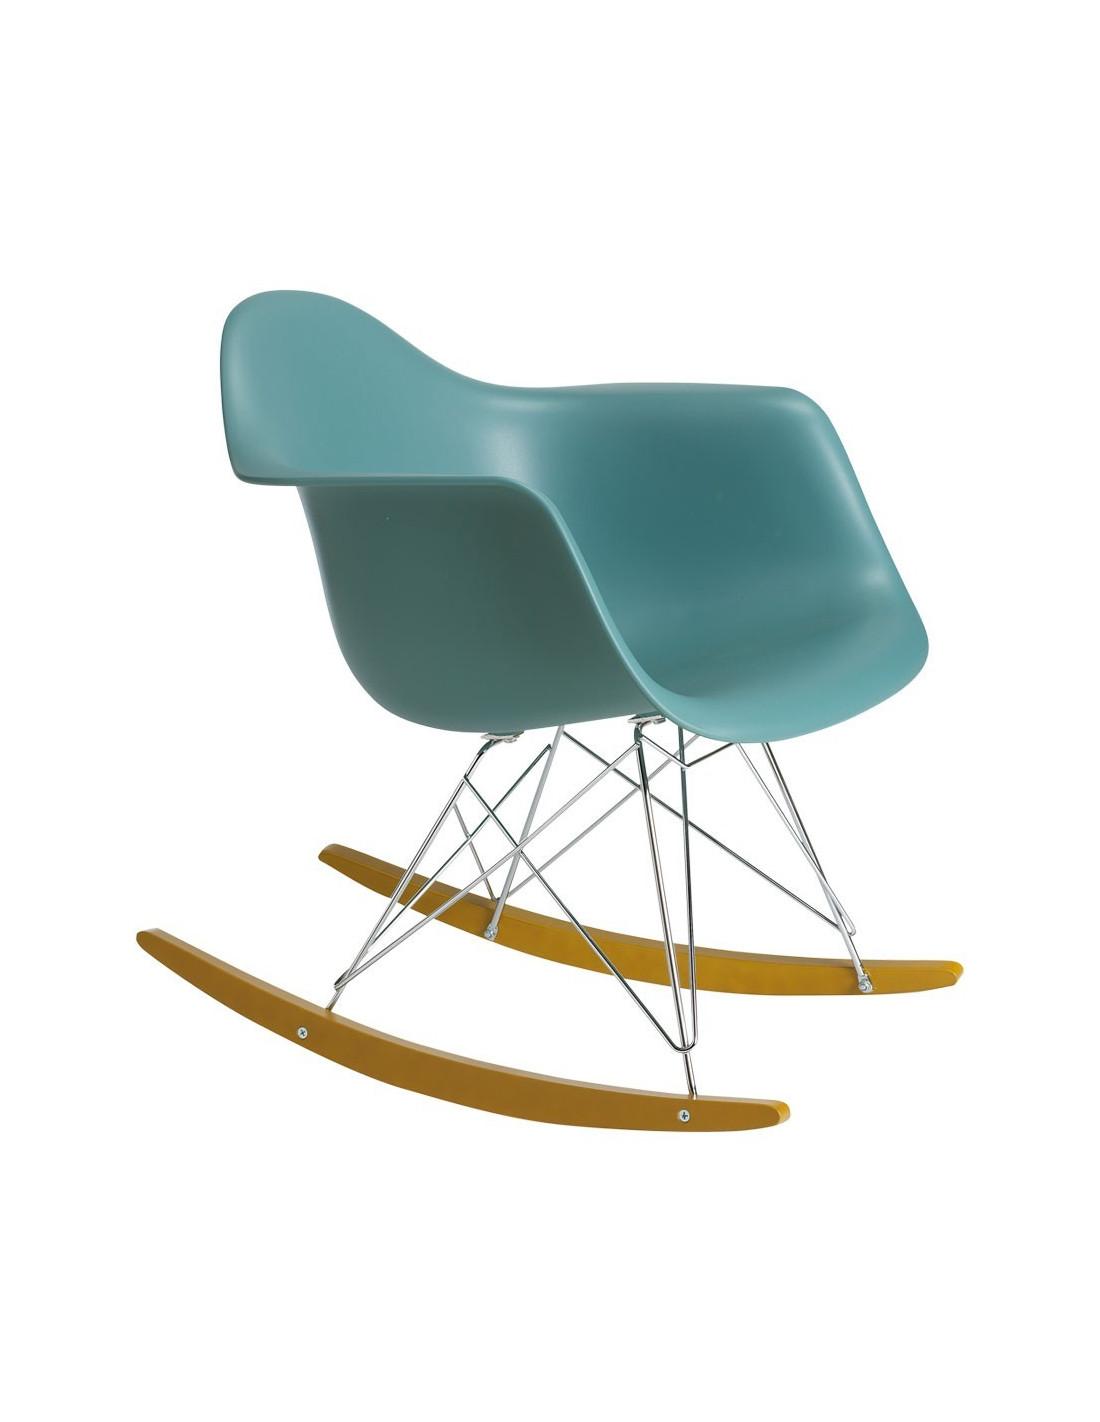 charles eames lounge chair stool counter height rar rocking & ray vitra